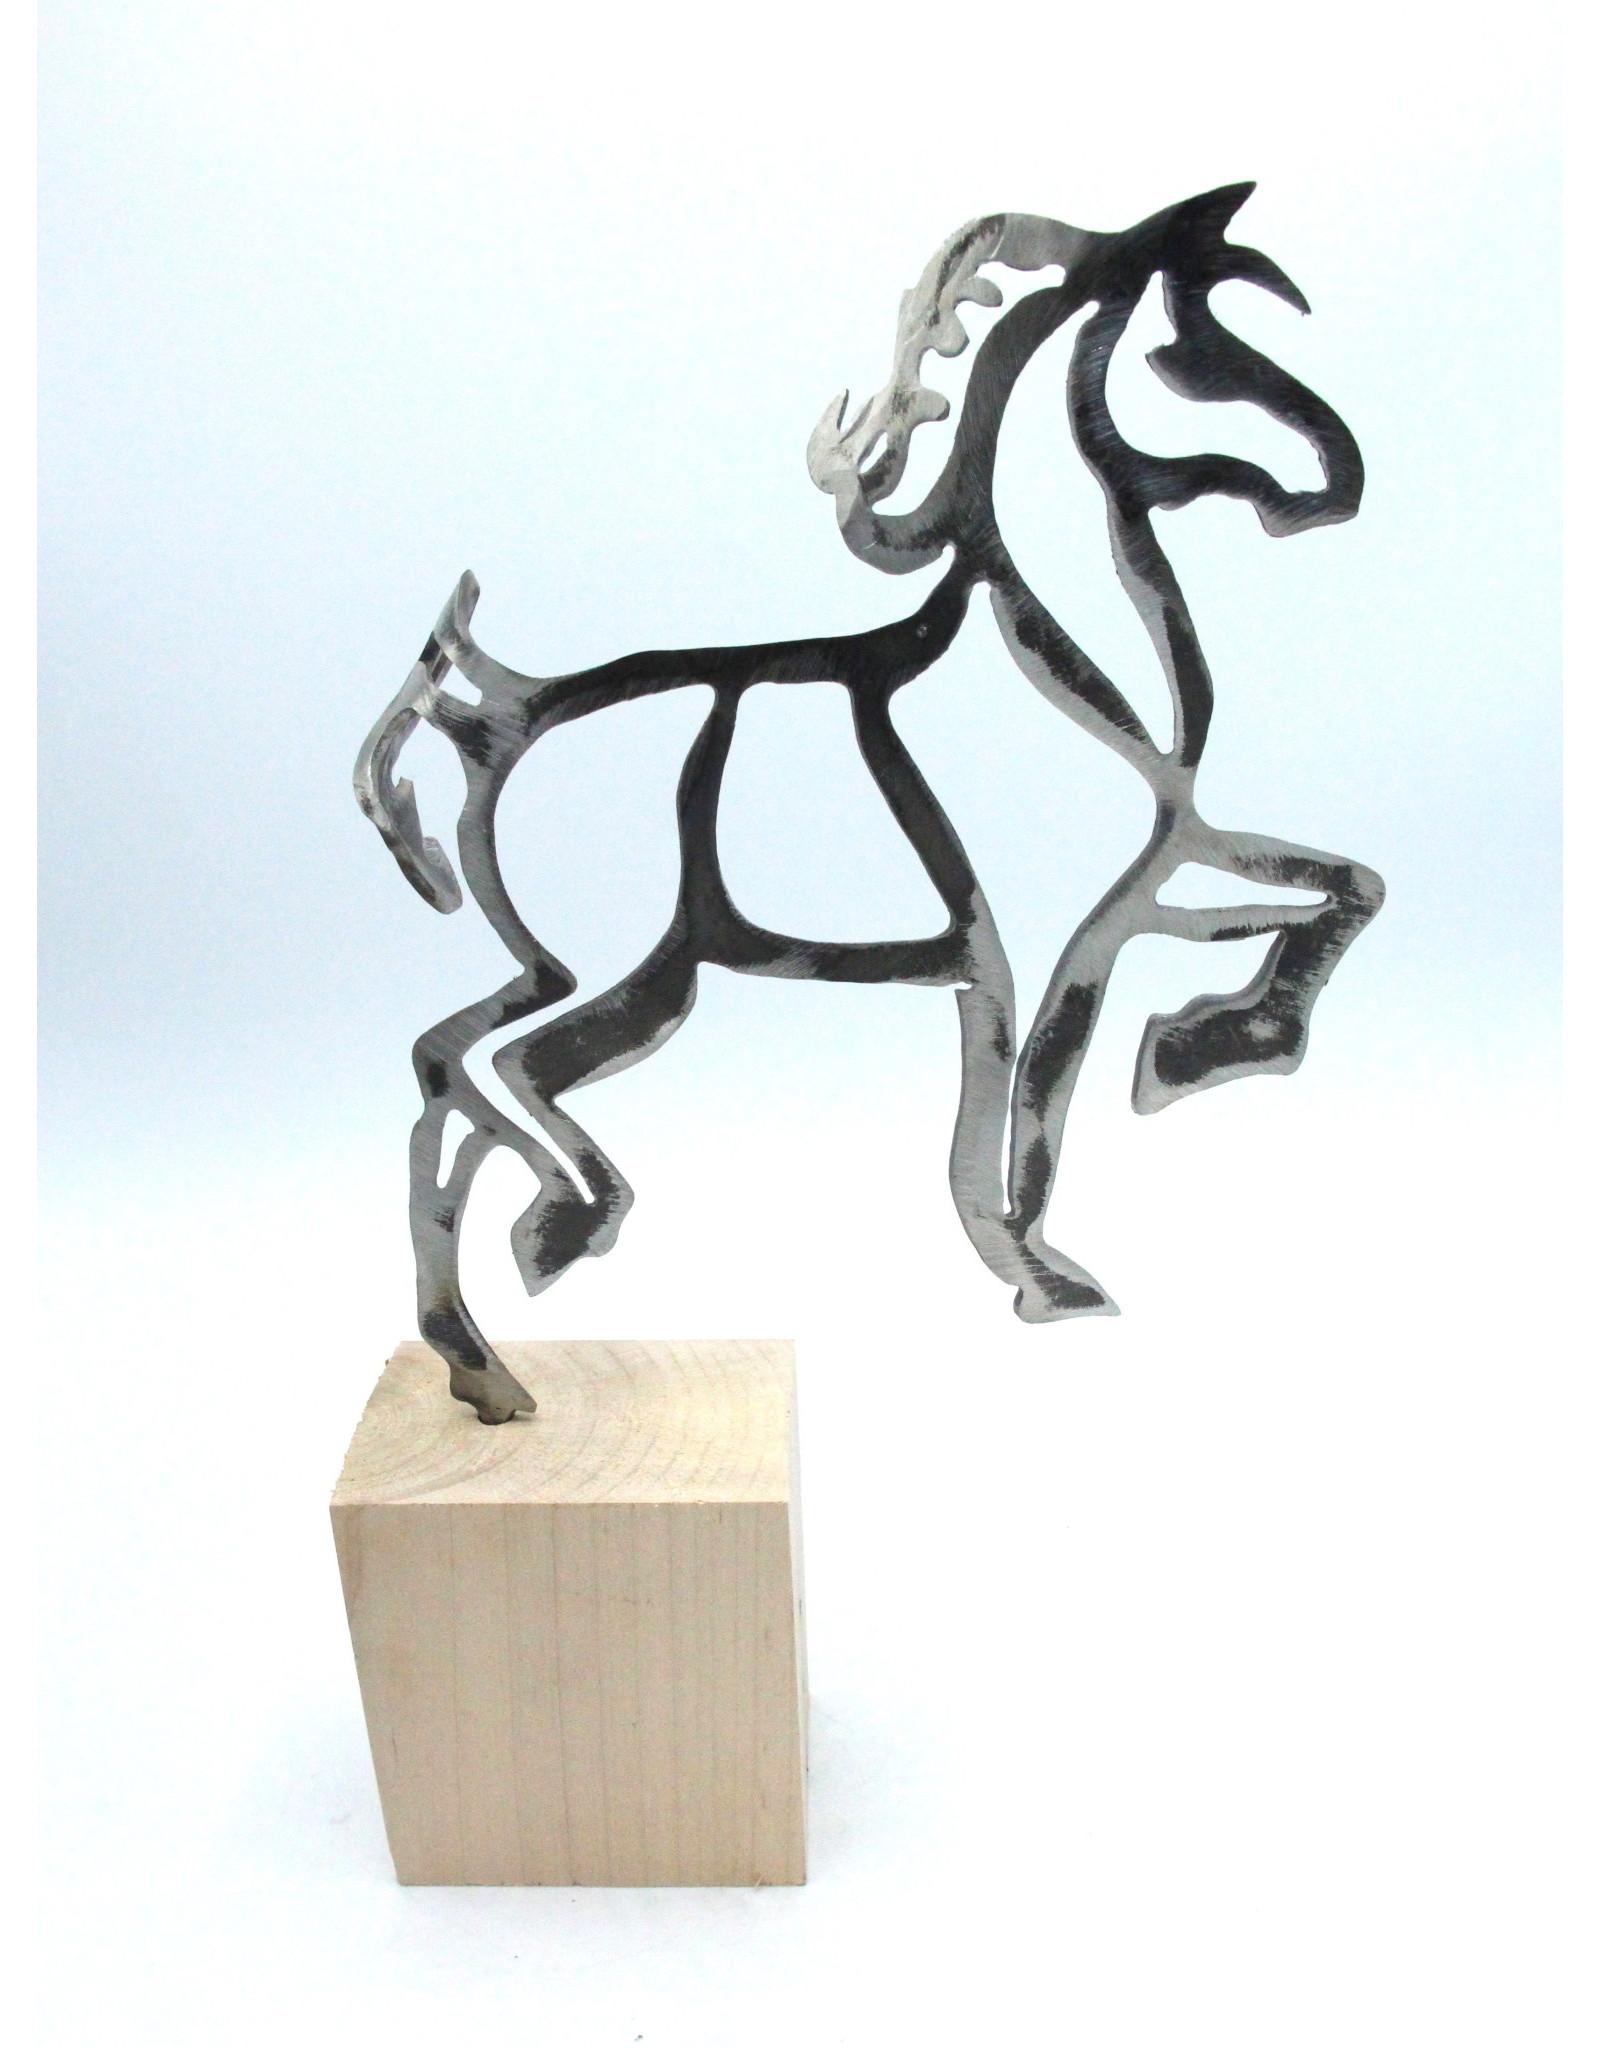 Metal Sculpture - Walking Horse